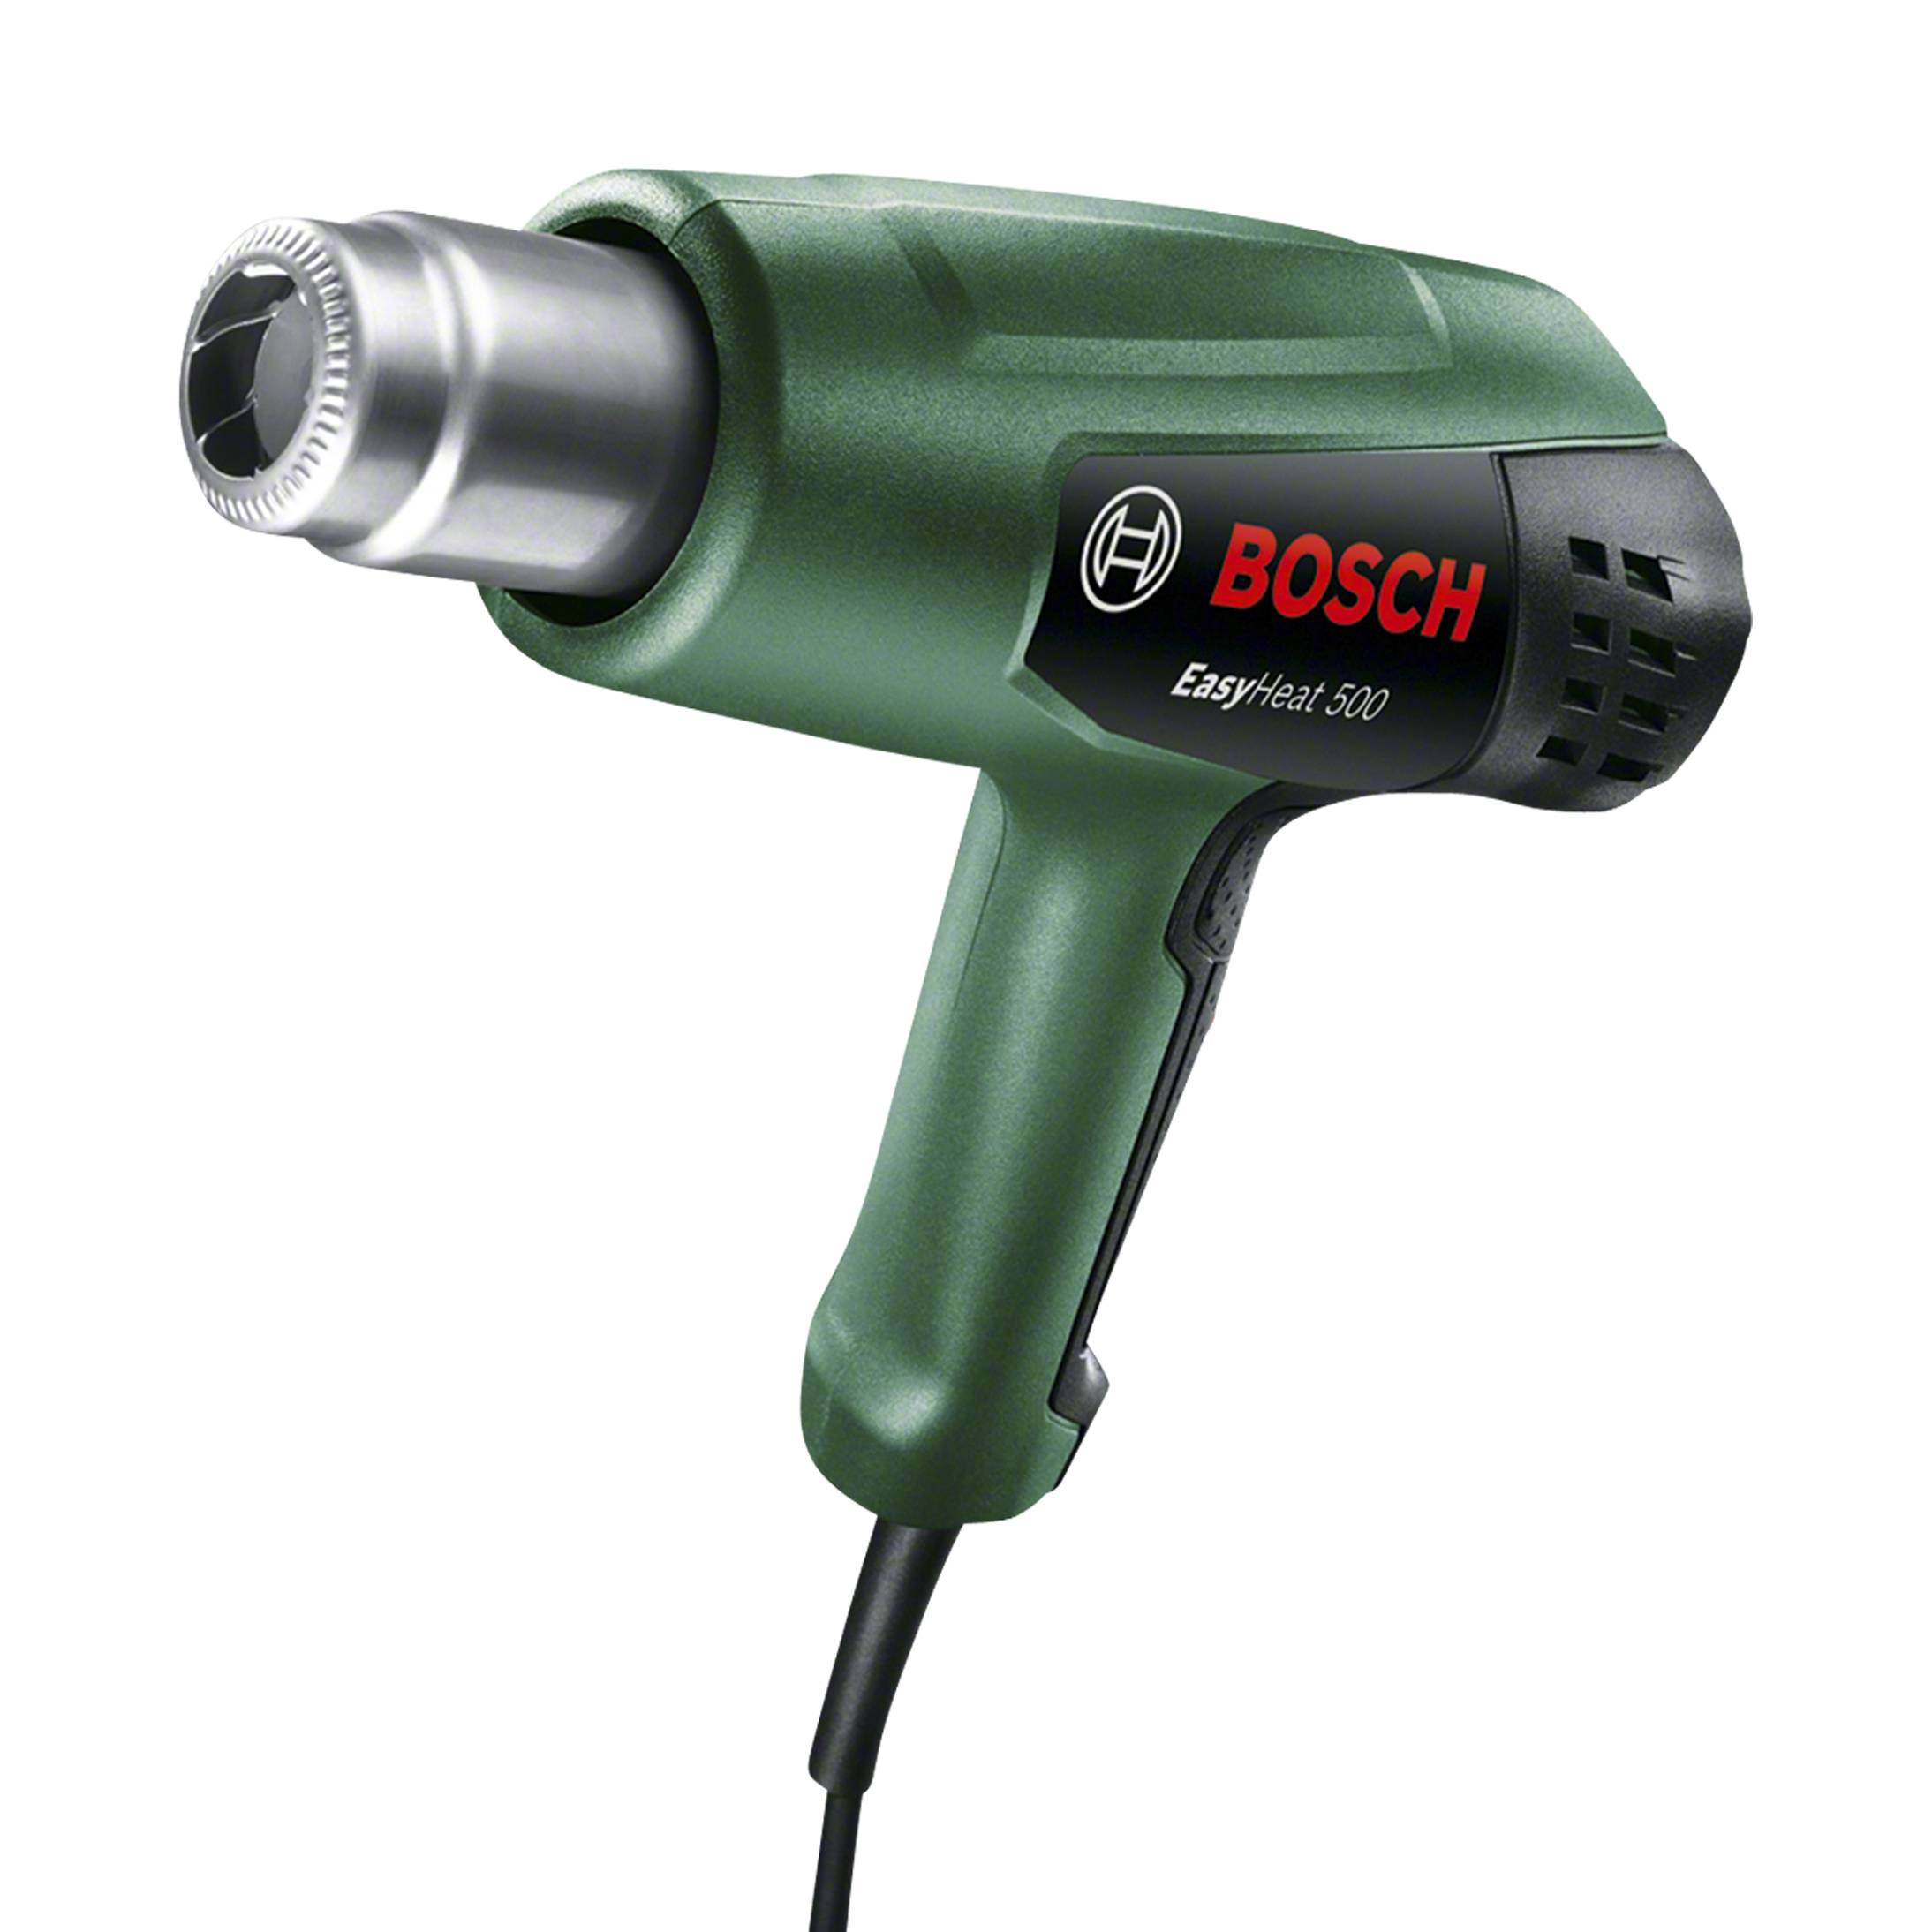 Bosch Heißluftpistole Bosch Easyheat 500